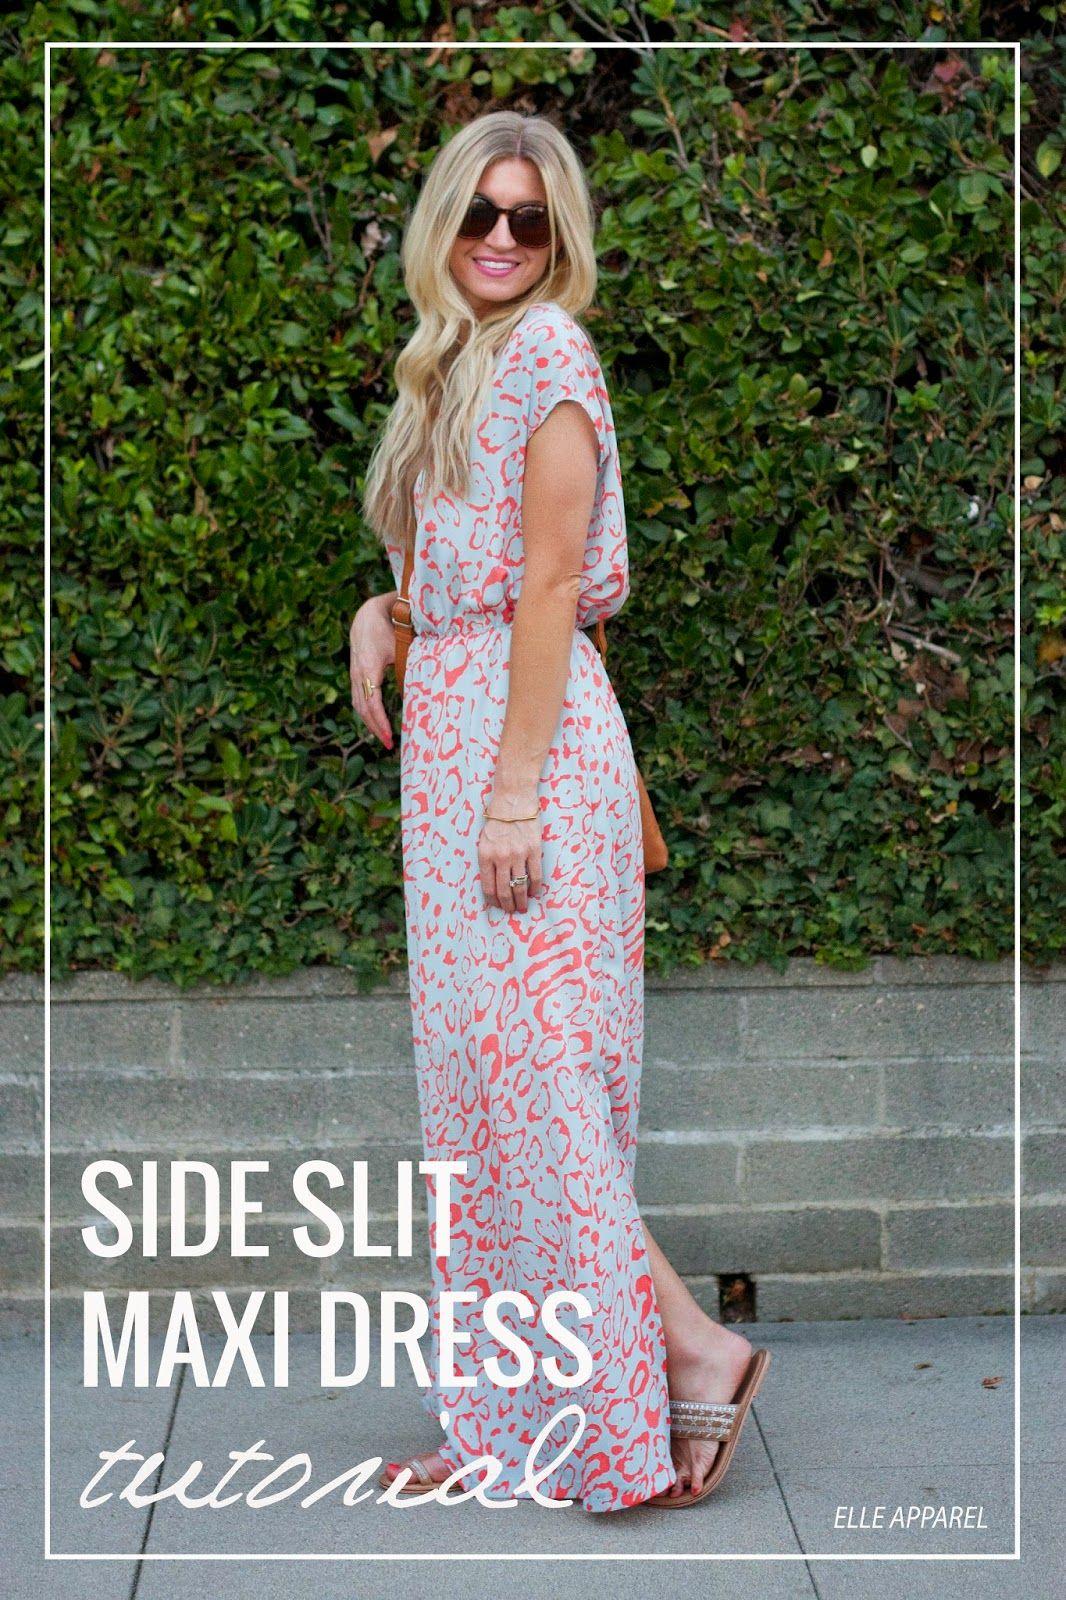 Side slit summer maxi dress with sleeves tutorial clothing side slit summer maxi dress with sleeves tutorial jeuxipadfo Images